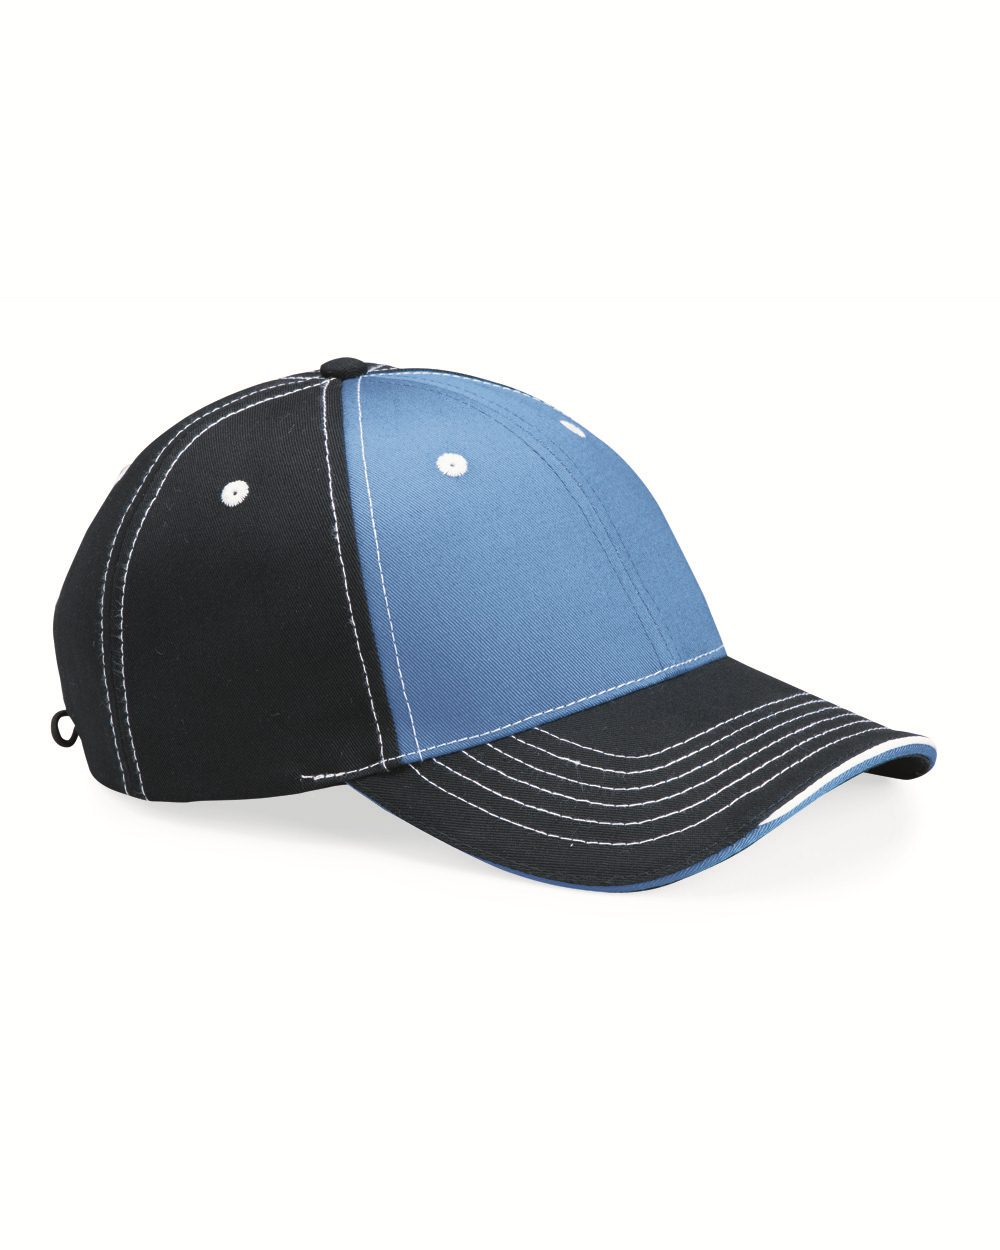 Sportsman 9500-Achiever Cap